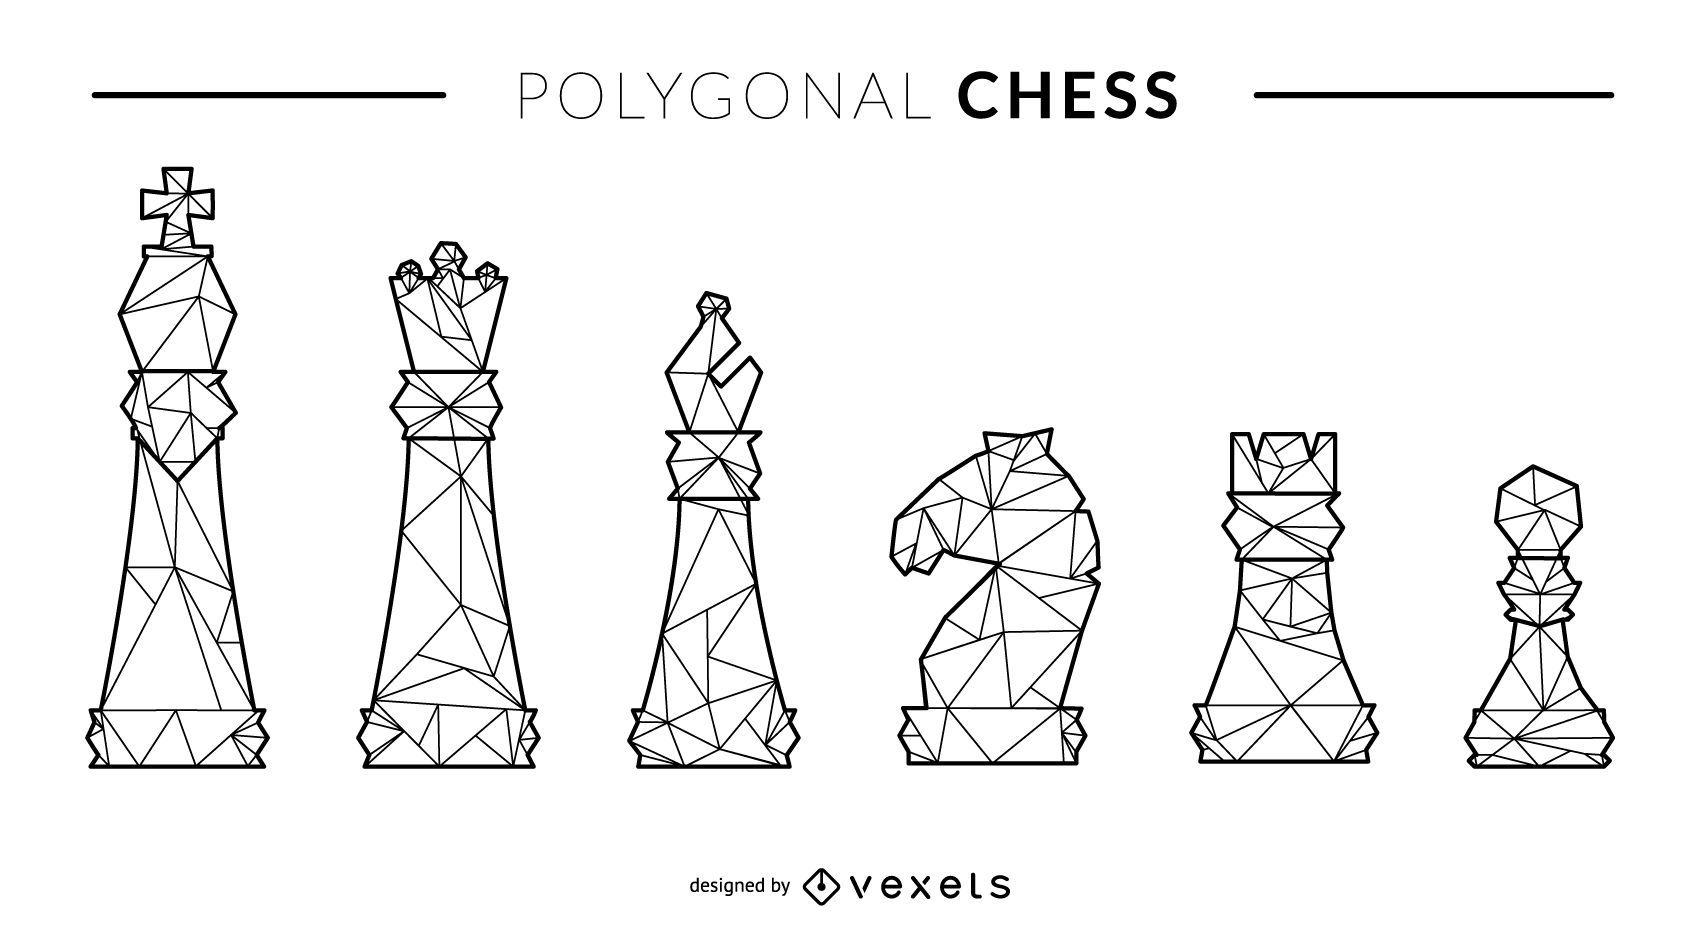 Juego de figuras de ajedrez de estilo de línea poligonal